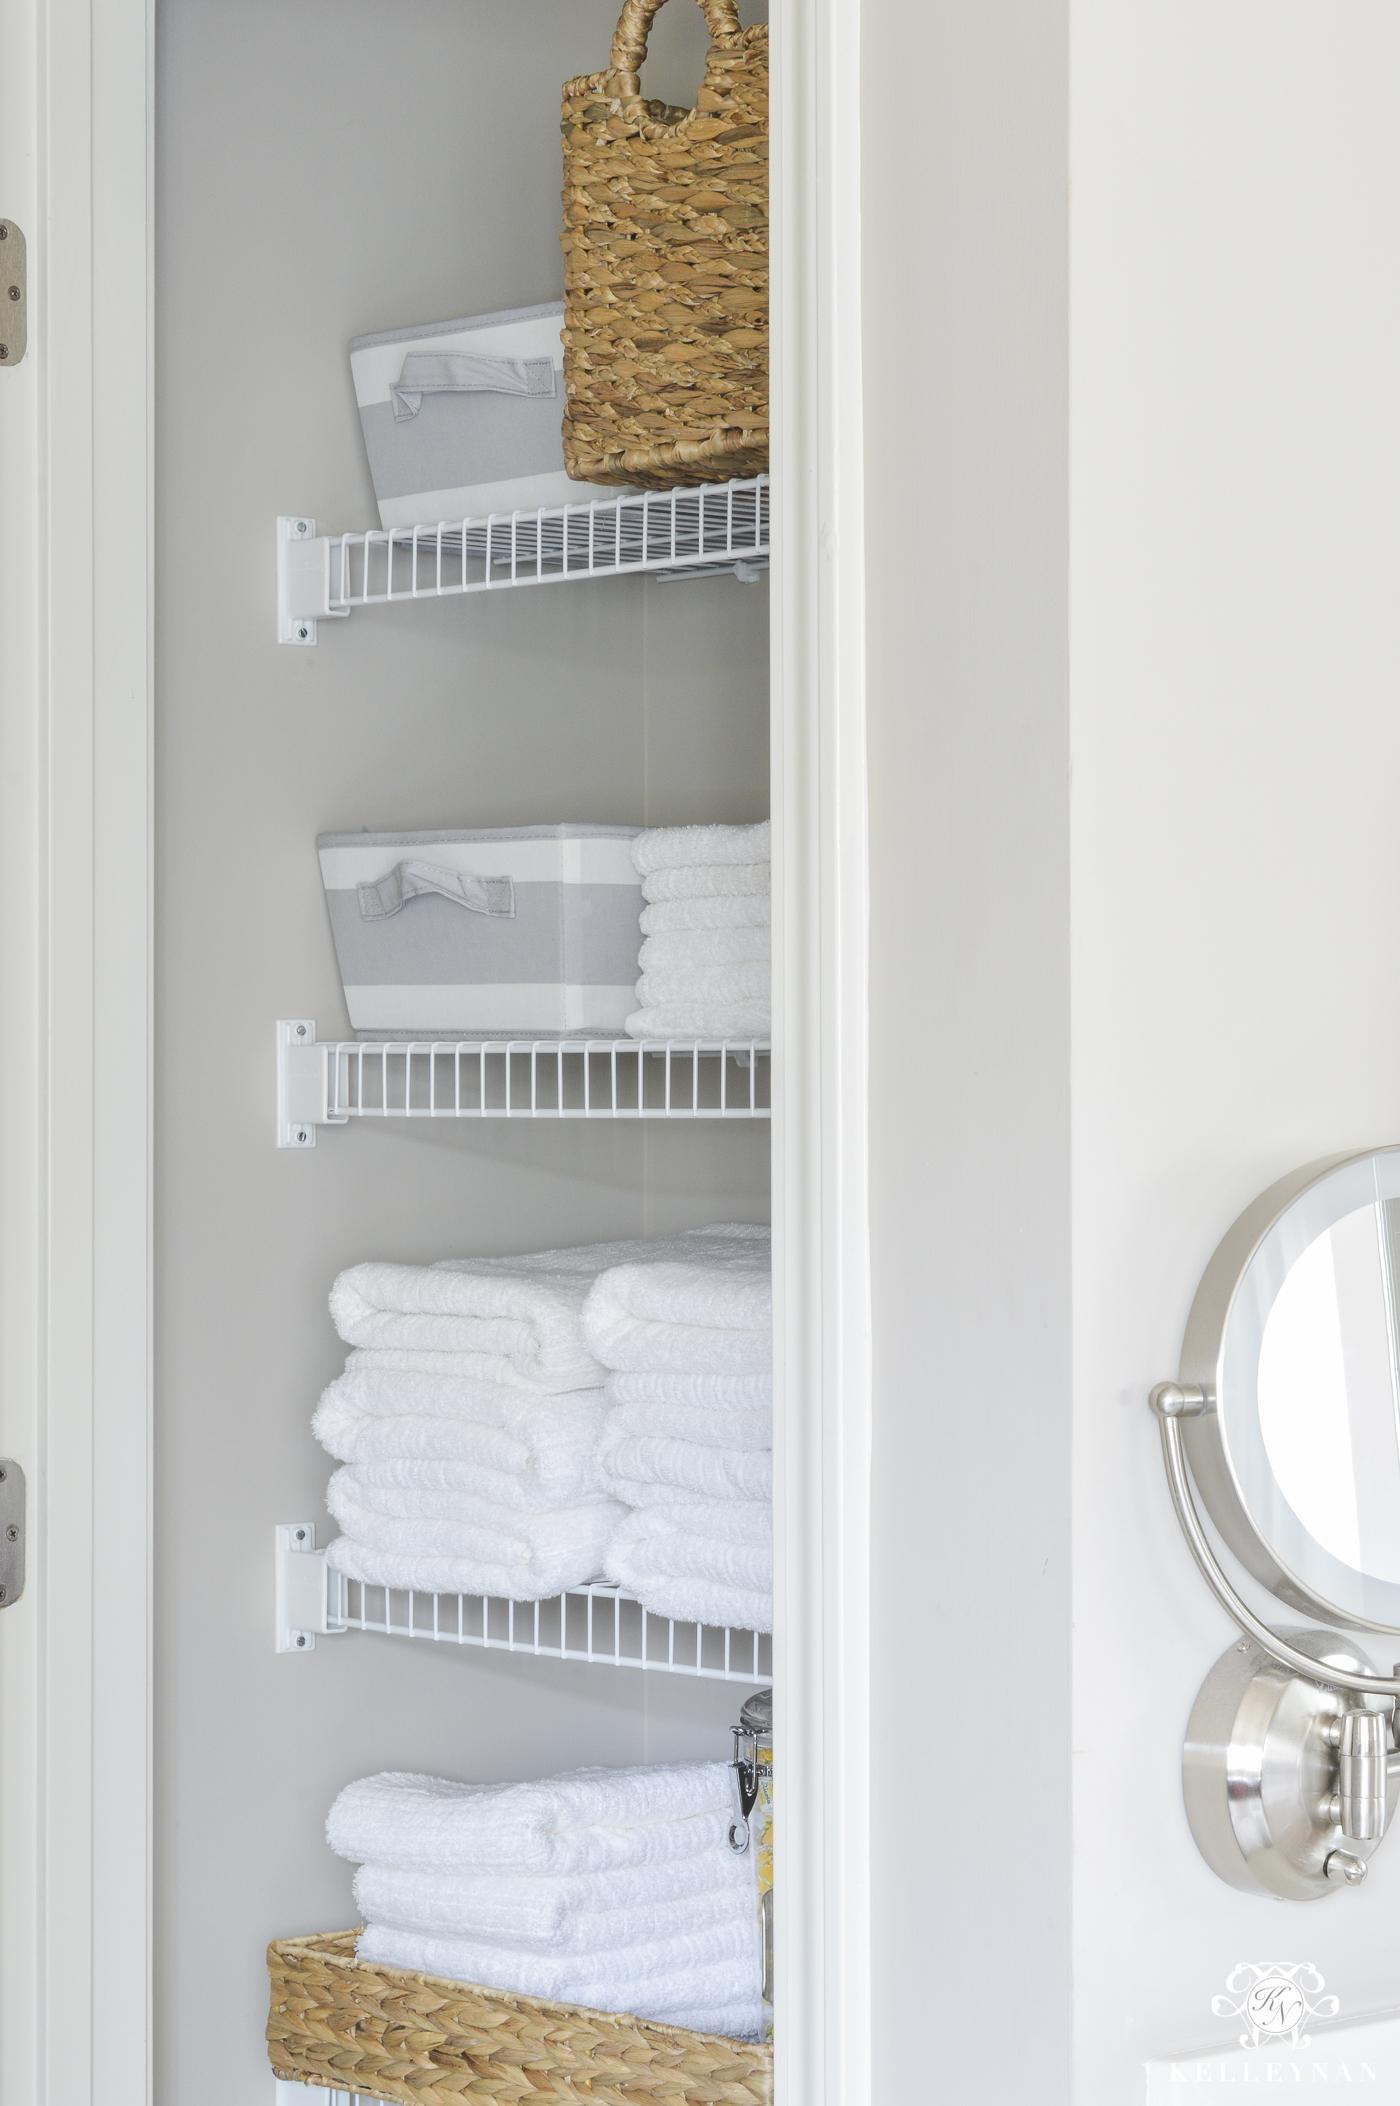 Remarkable Organized Bathroom Linen Closet Anyone Can Have Kelley Nan Hairstyles For Women Draintrainus